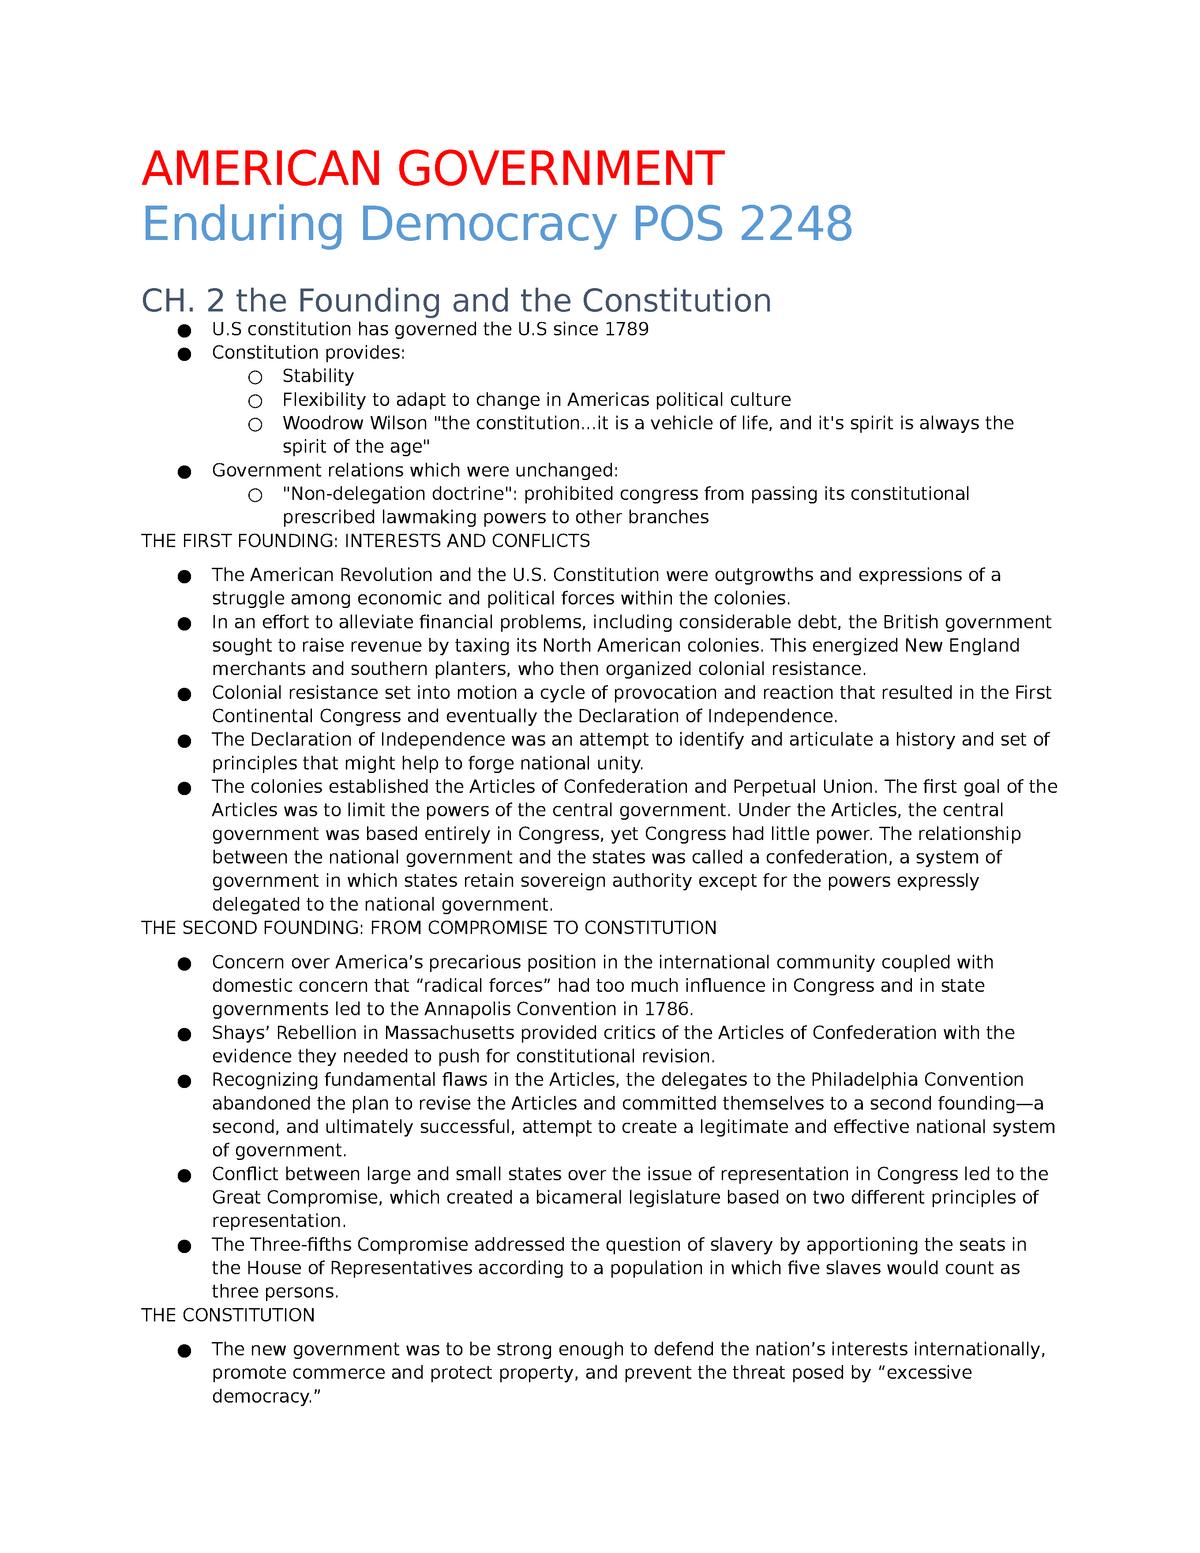 American Gov't Notes - POS 2041: American Government - StuDocu